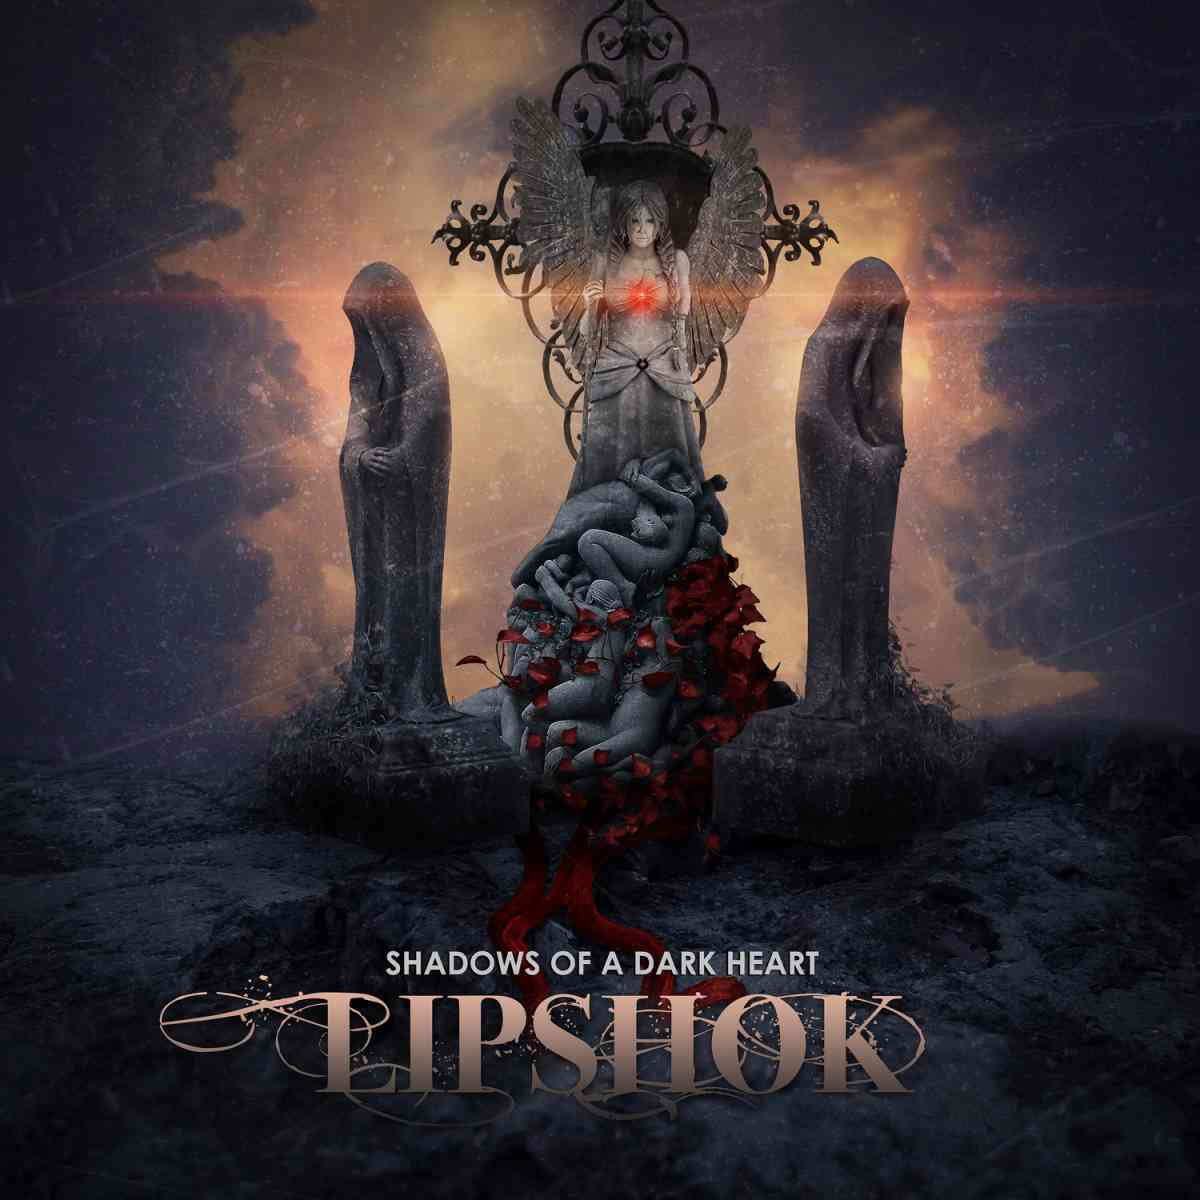 Lipshok - Shadows Of A Dark Heart - album cover